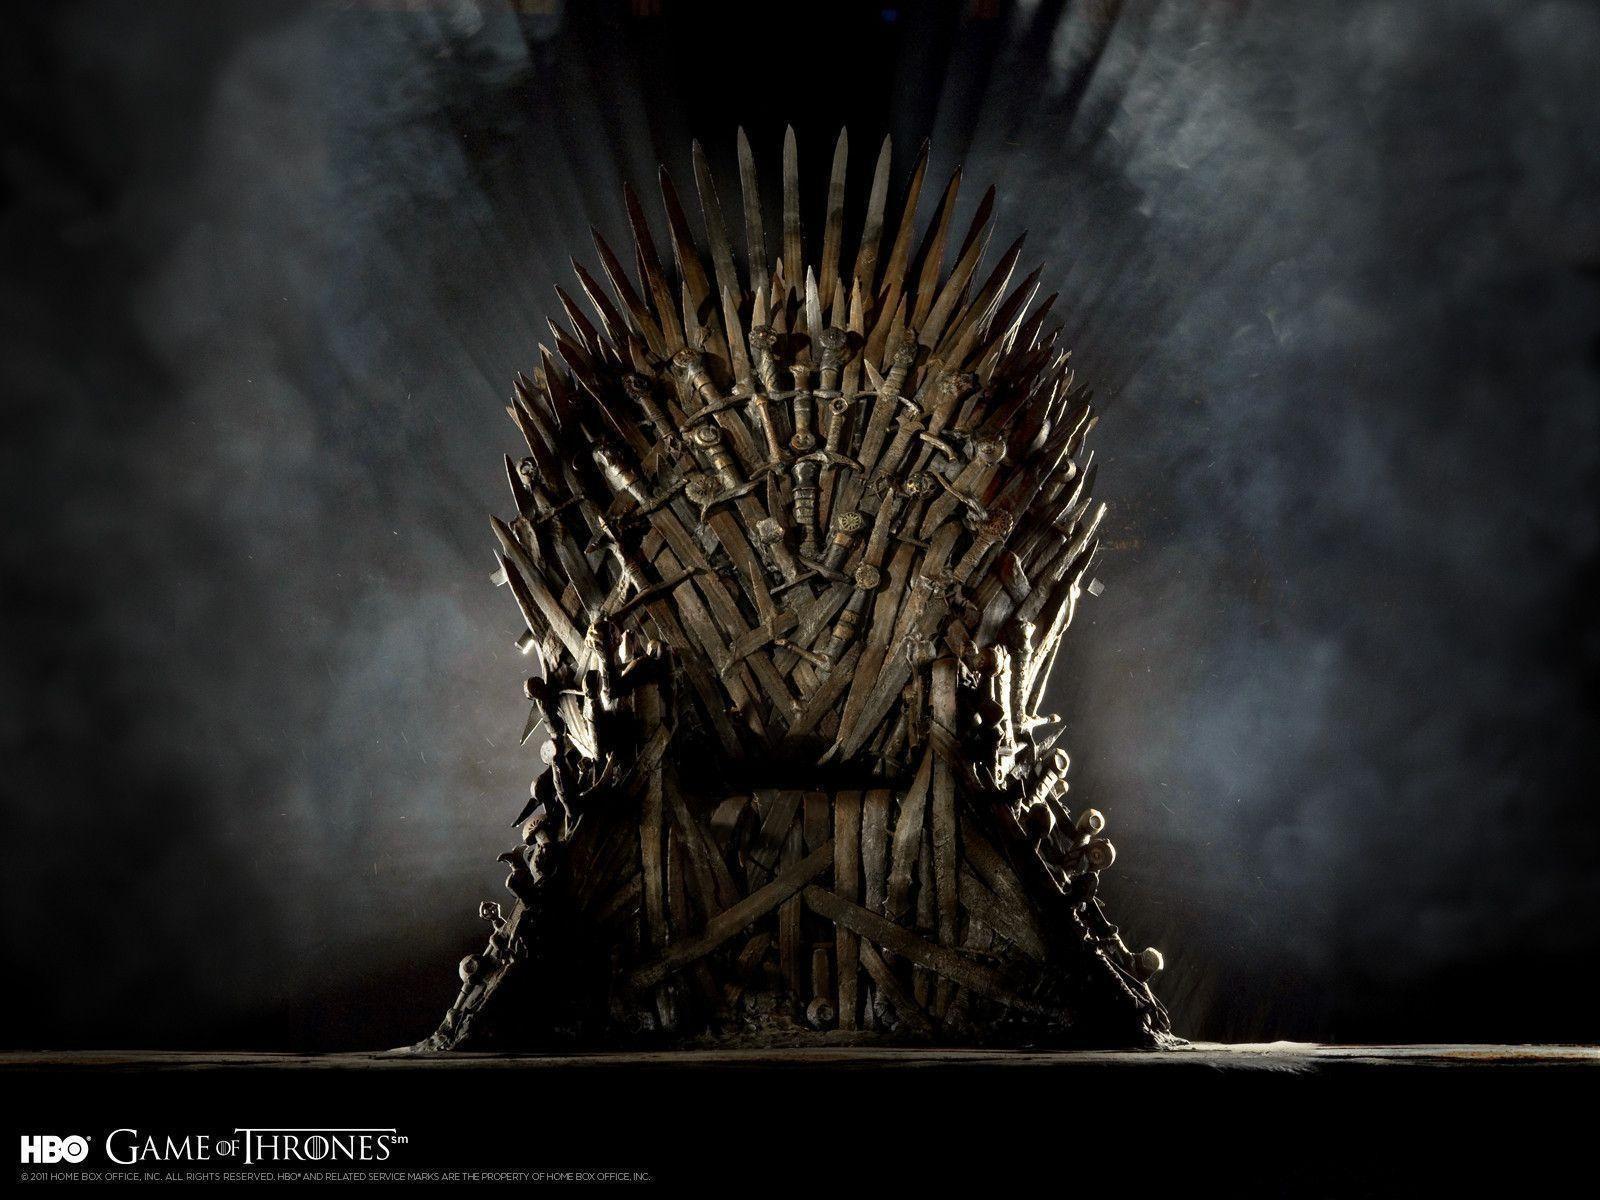 Game of thrones 8k resmi